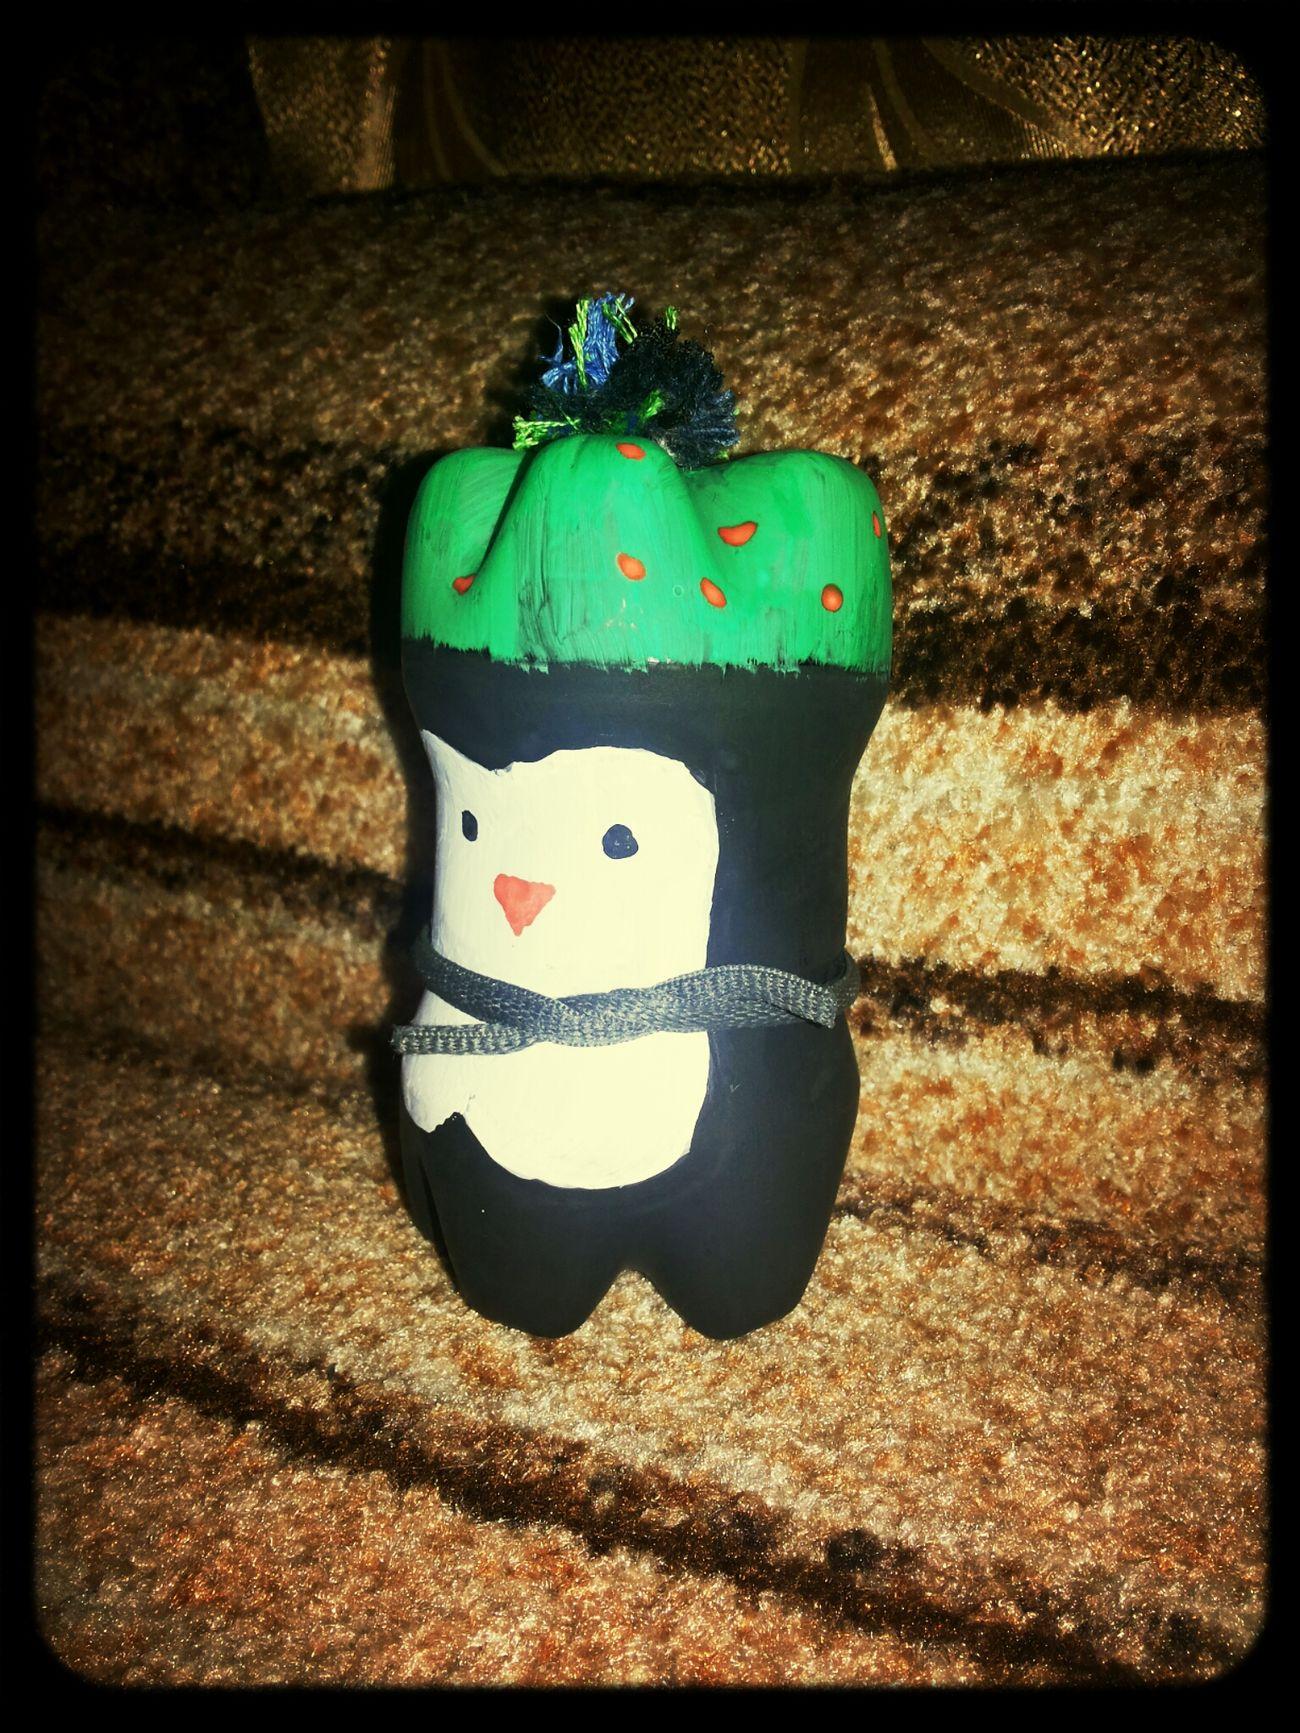 Подготовка к новому году, пингвин из 2 бутылок)) Relaxing Cheese! Hi! Cheremkhovo